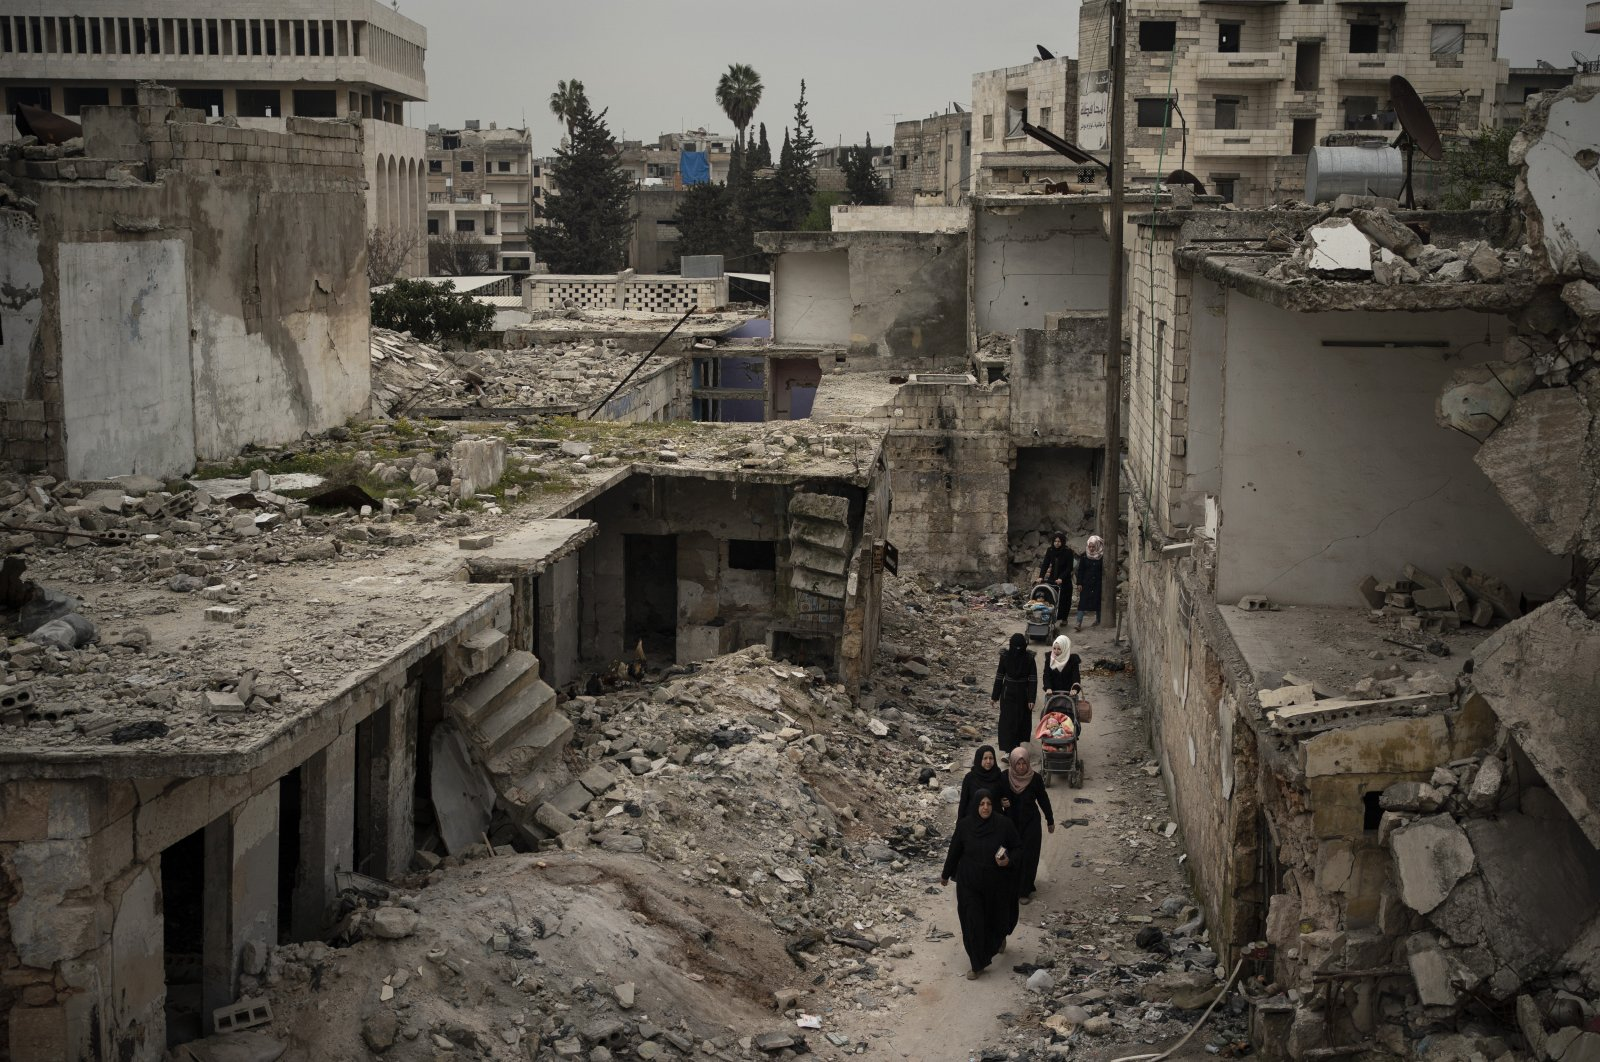 Women walk in a neighborhood heavily damaged by airstrikes in Idlib, March 12, 2020. (AP)